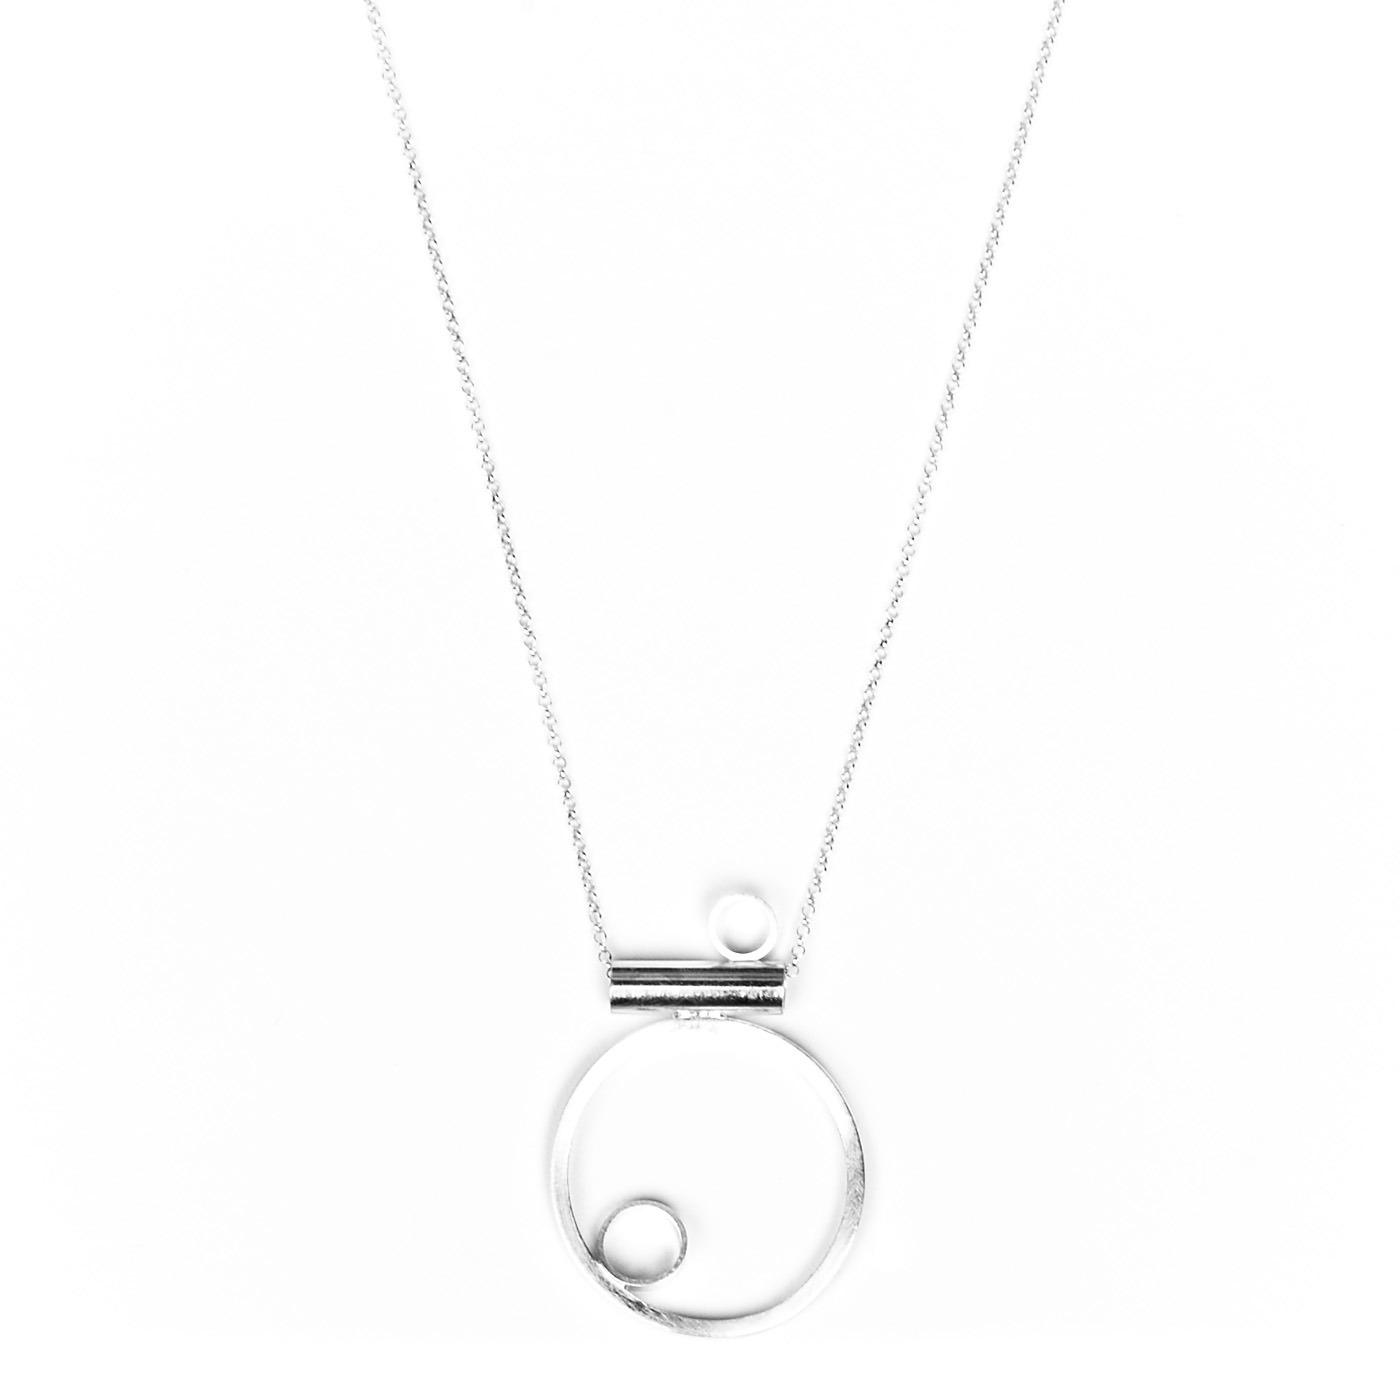 Artisan, Eco-Friendly, Designer Moonlight Necklace